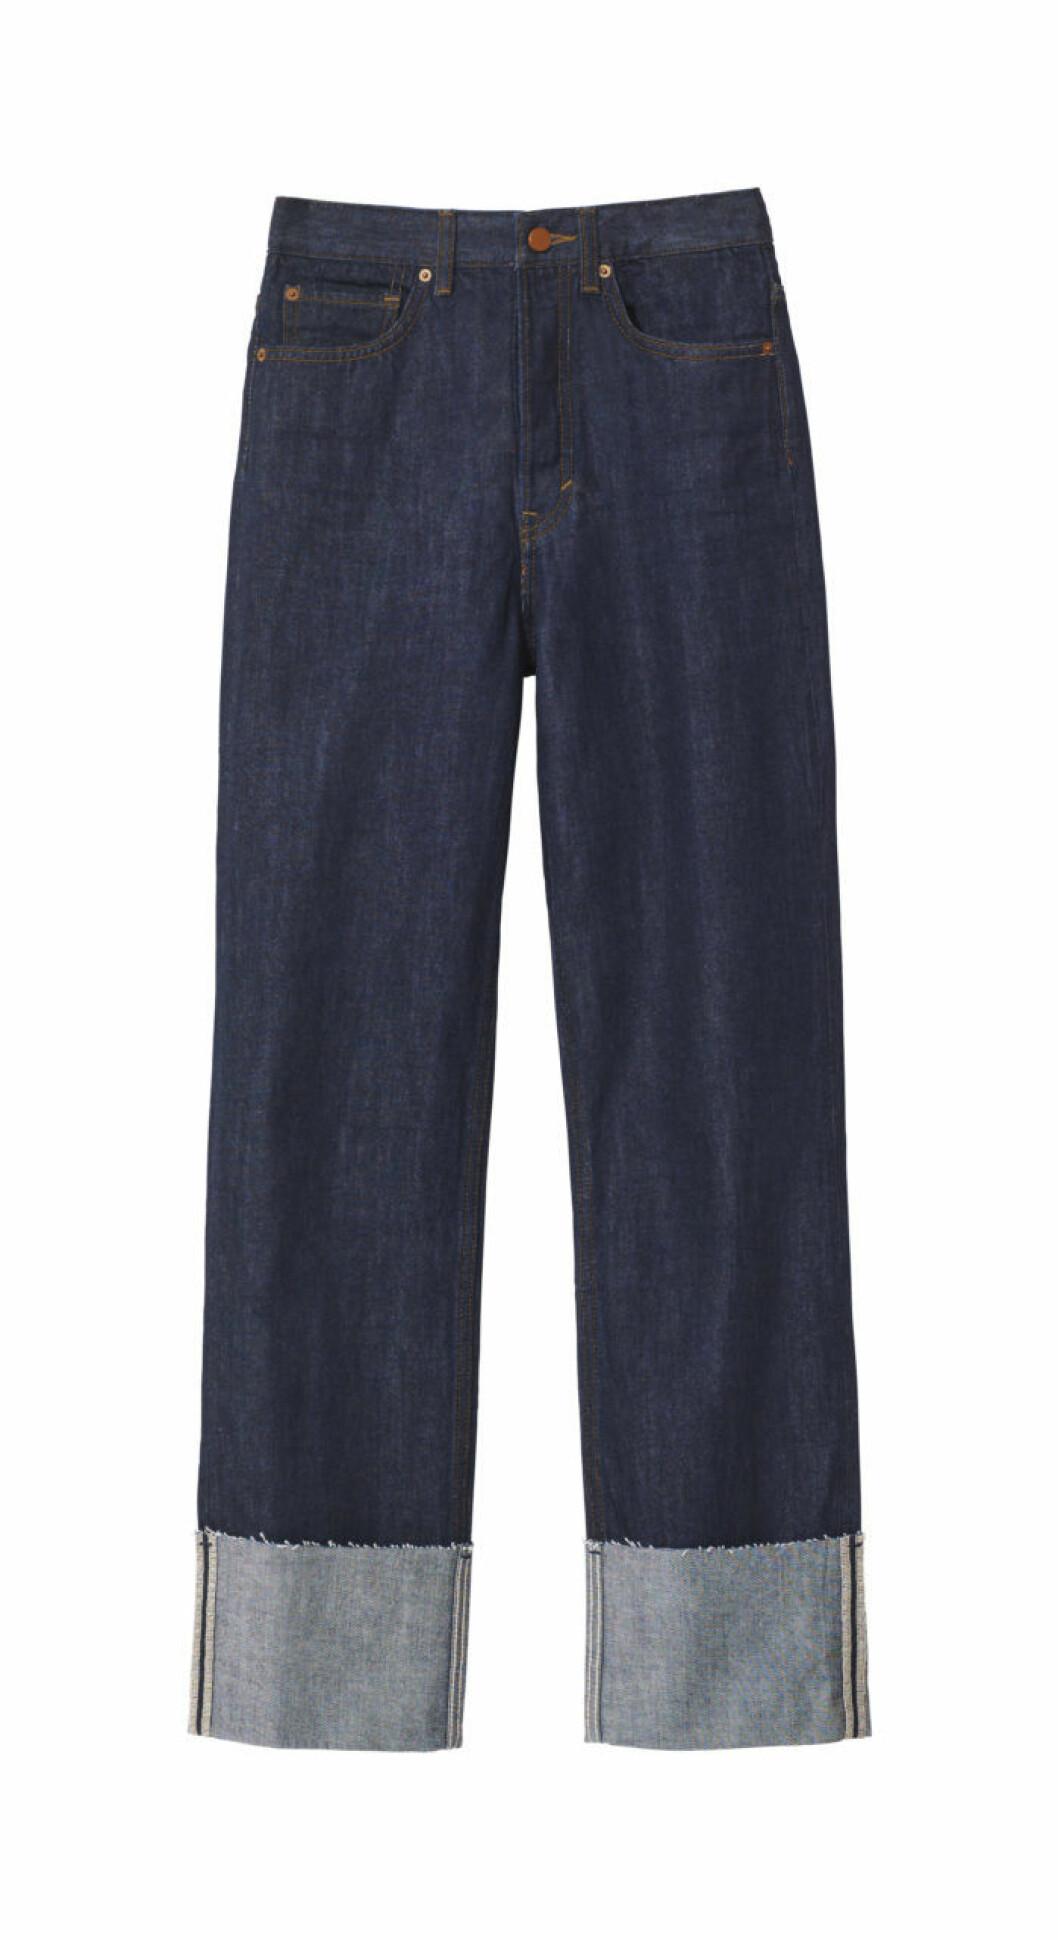 Mörkblå jeans H&M studio AW 2018